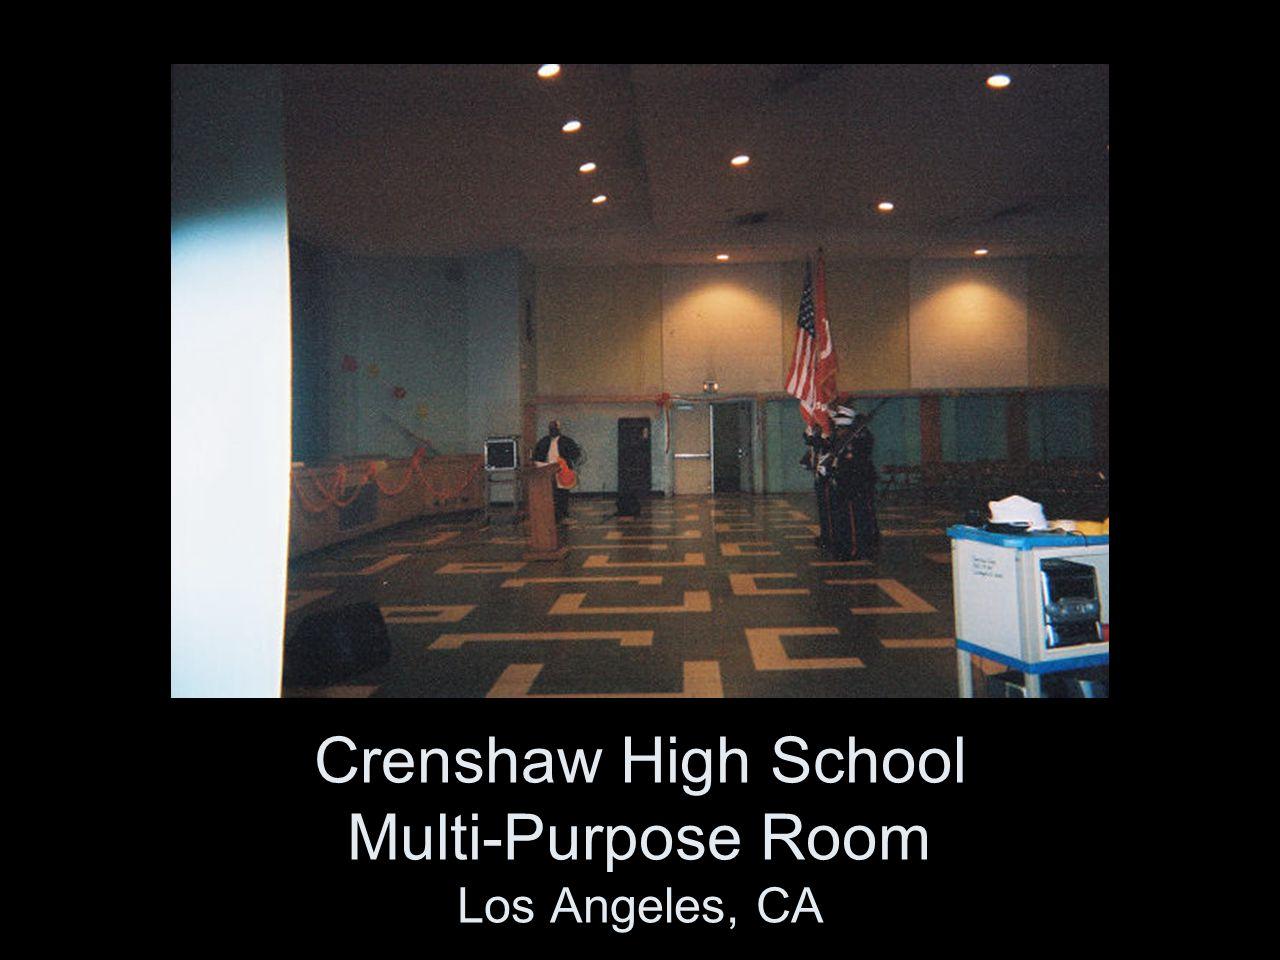 Crenshaw High School Multi-Purpose Room Los Angeles, CA